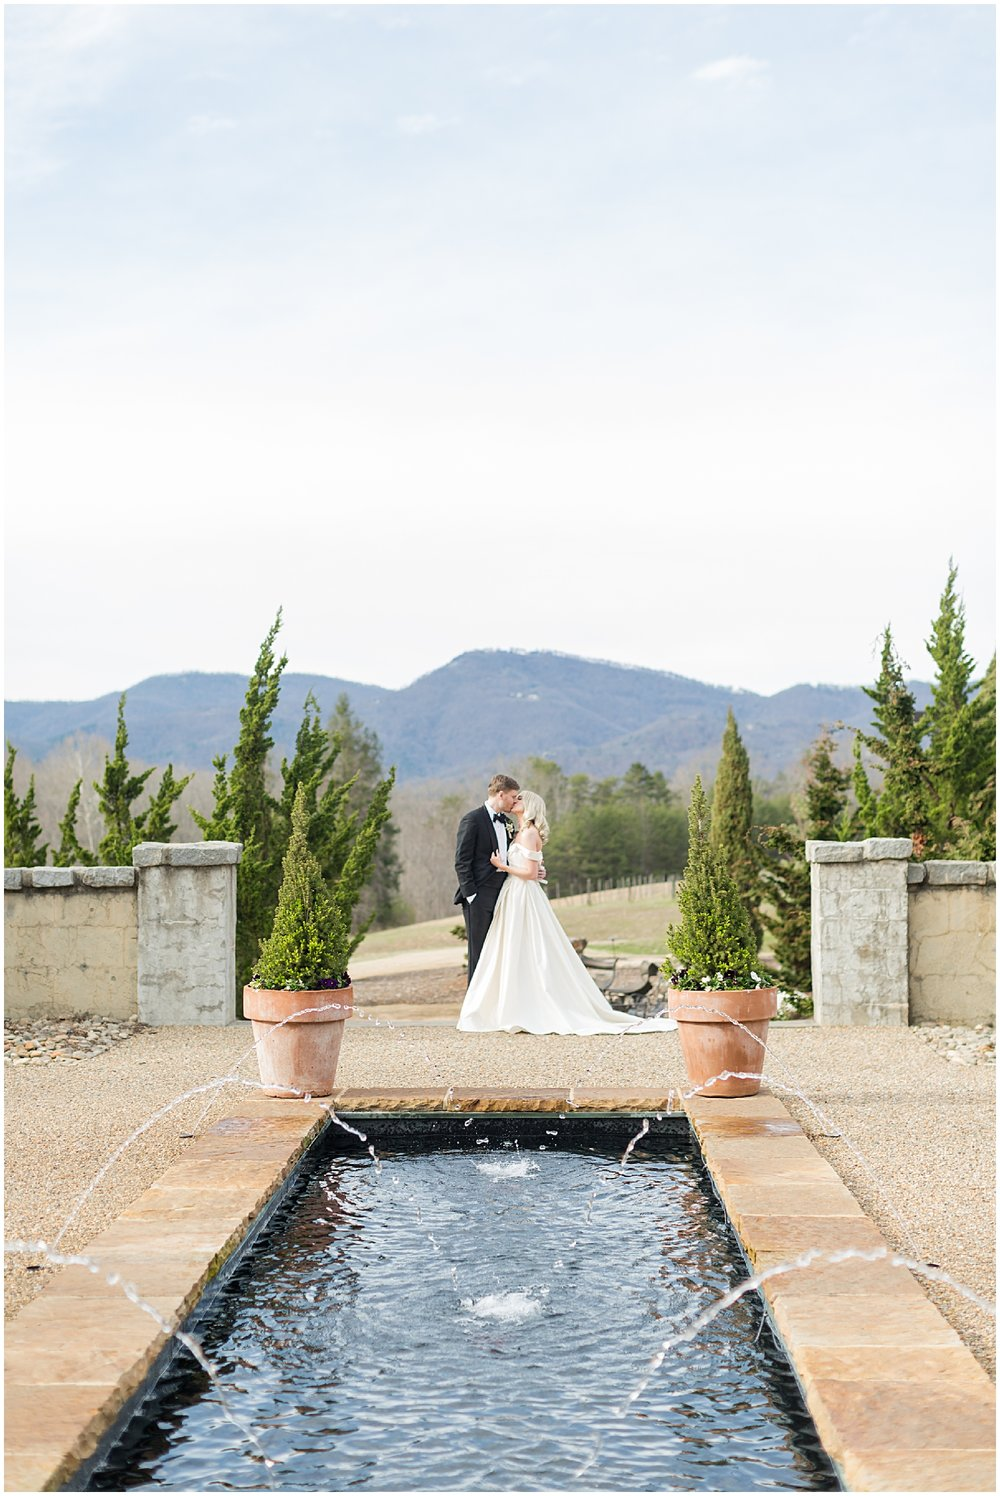 Spring Wedding at Hotel Domestique | Bespoken Wedding Planners | Ryan & Alyssa Photography